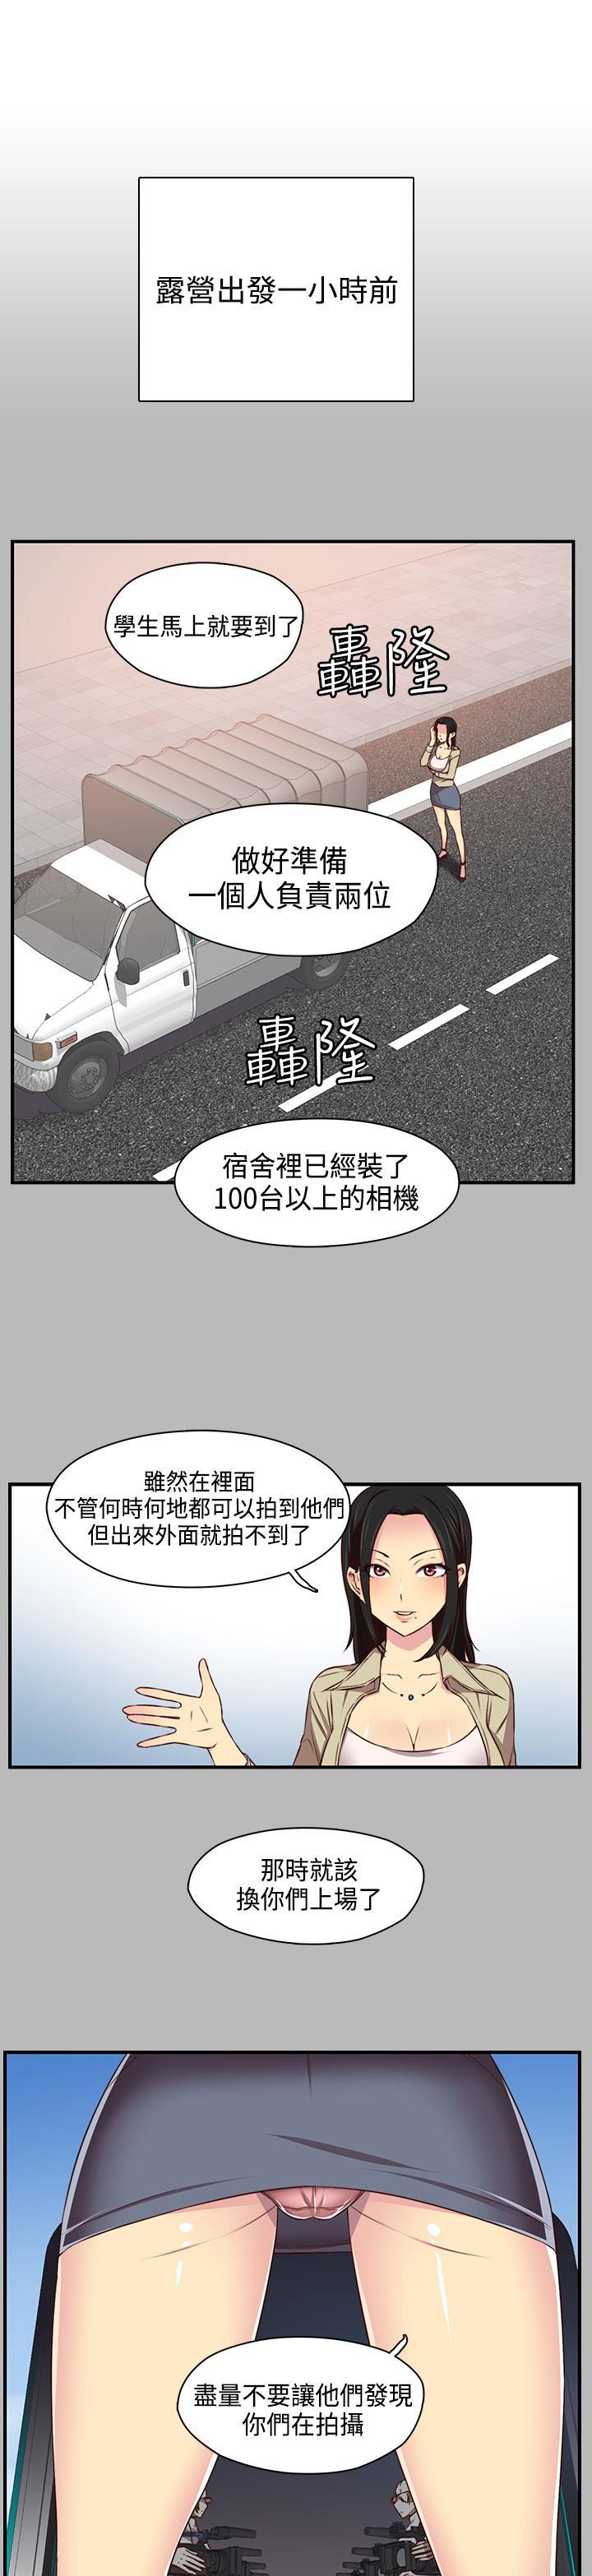 [Dasum & Puutaro] H-Campus H校园<第2季> ch.41-46 (chinese) 129